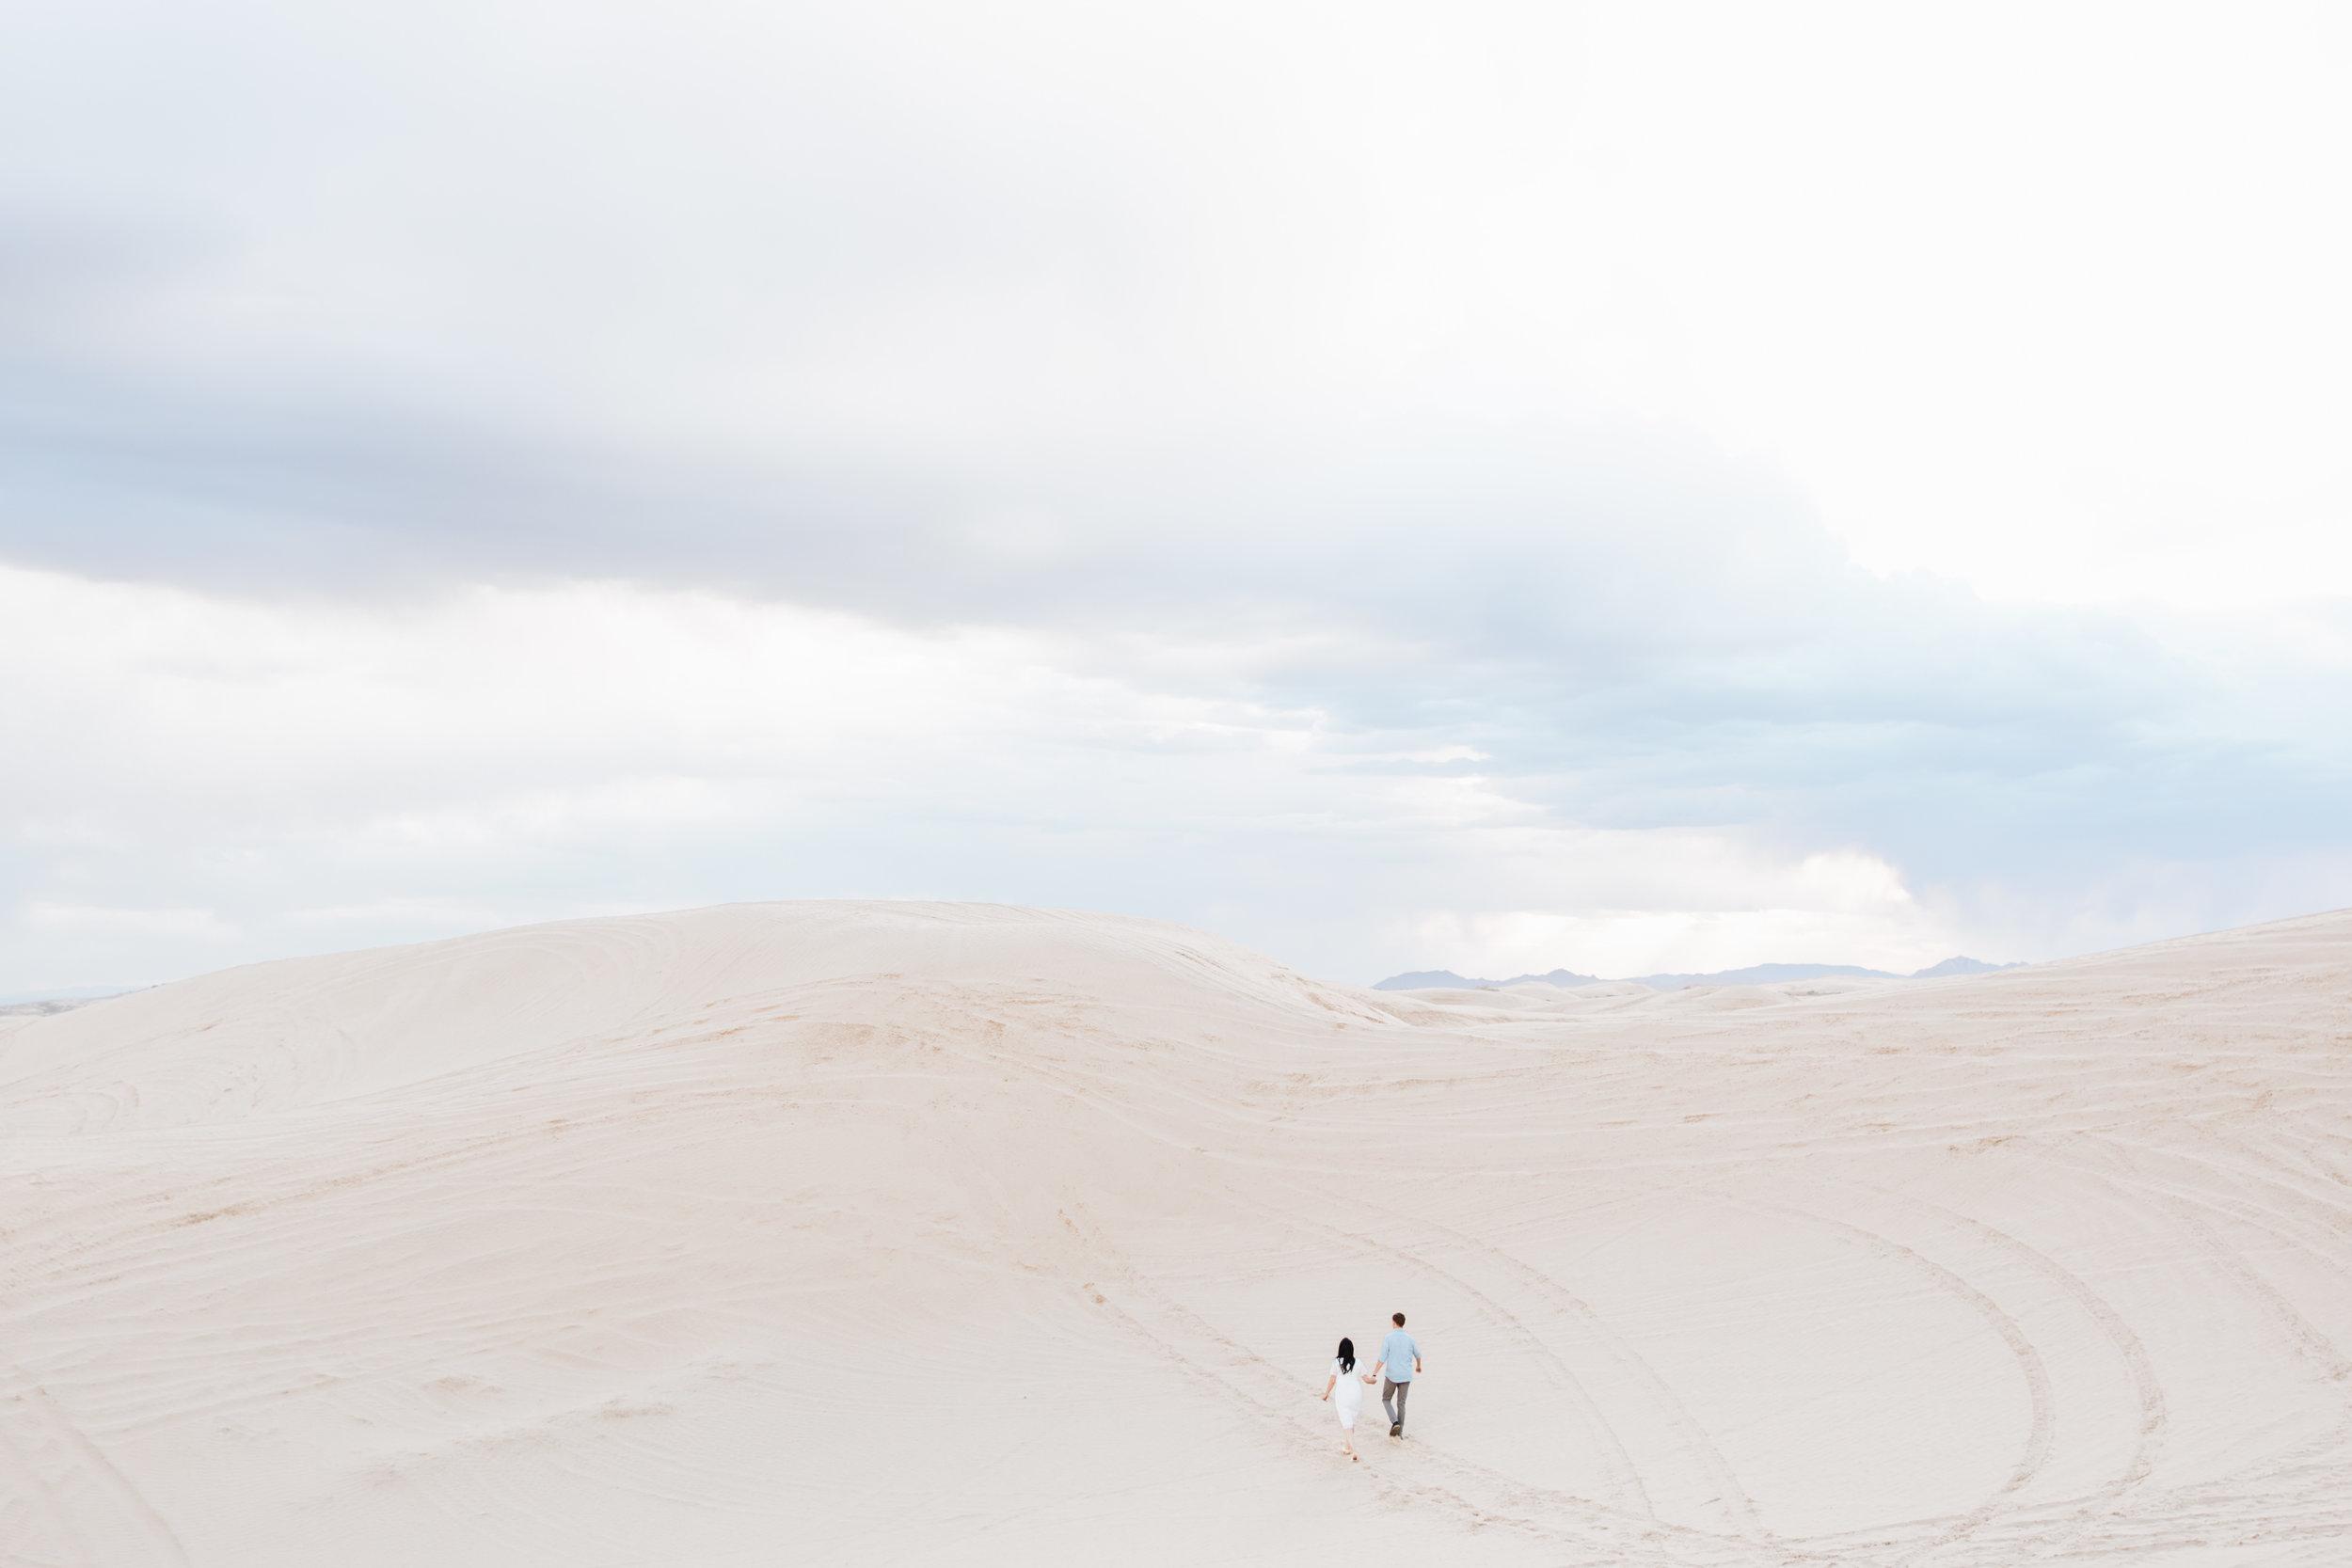 little-sahara-recreation-area-elopement-engagement-wedding-photography-michael-cozzens-67.jpg